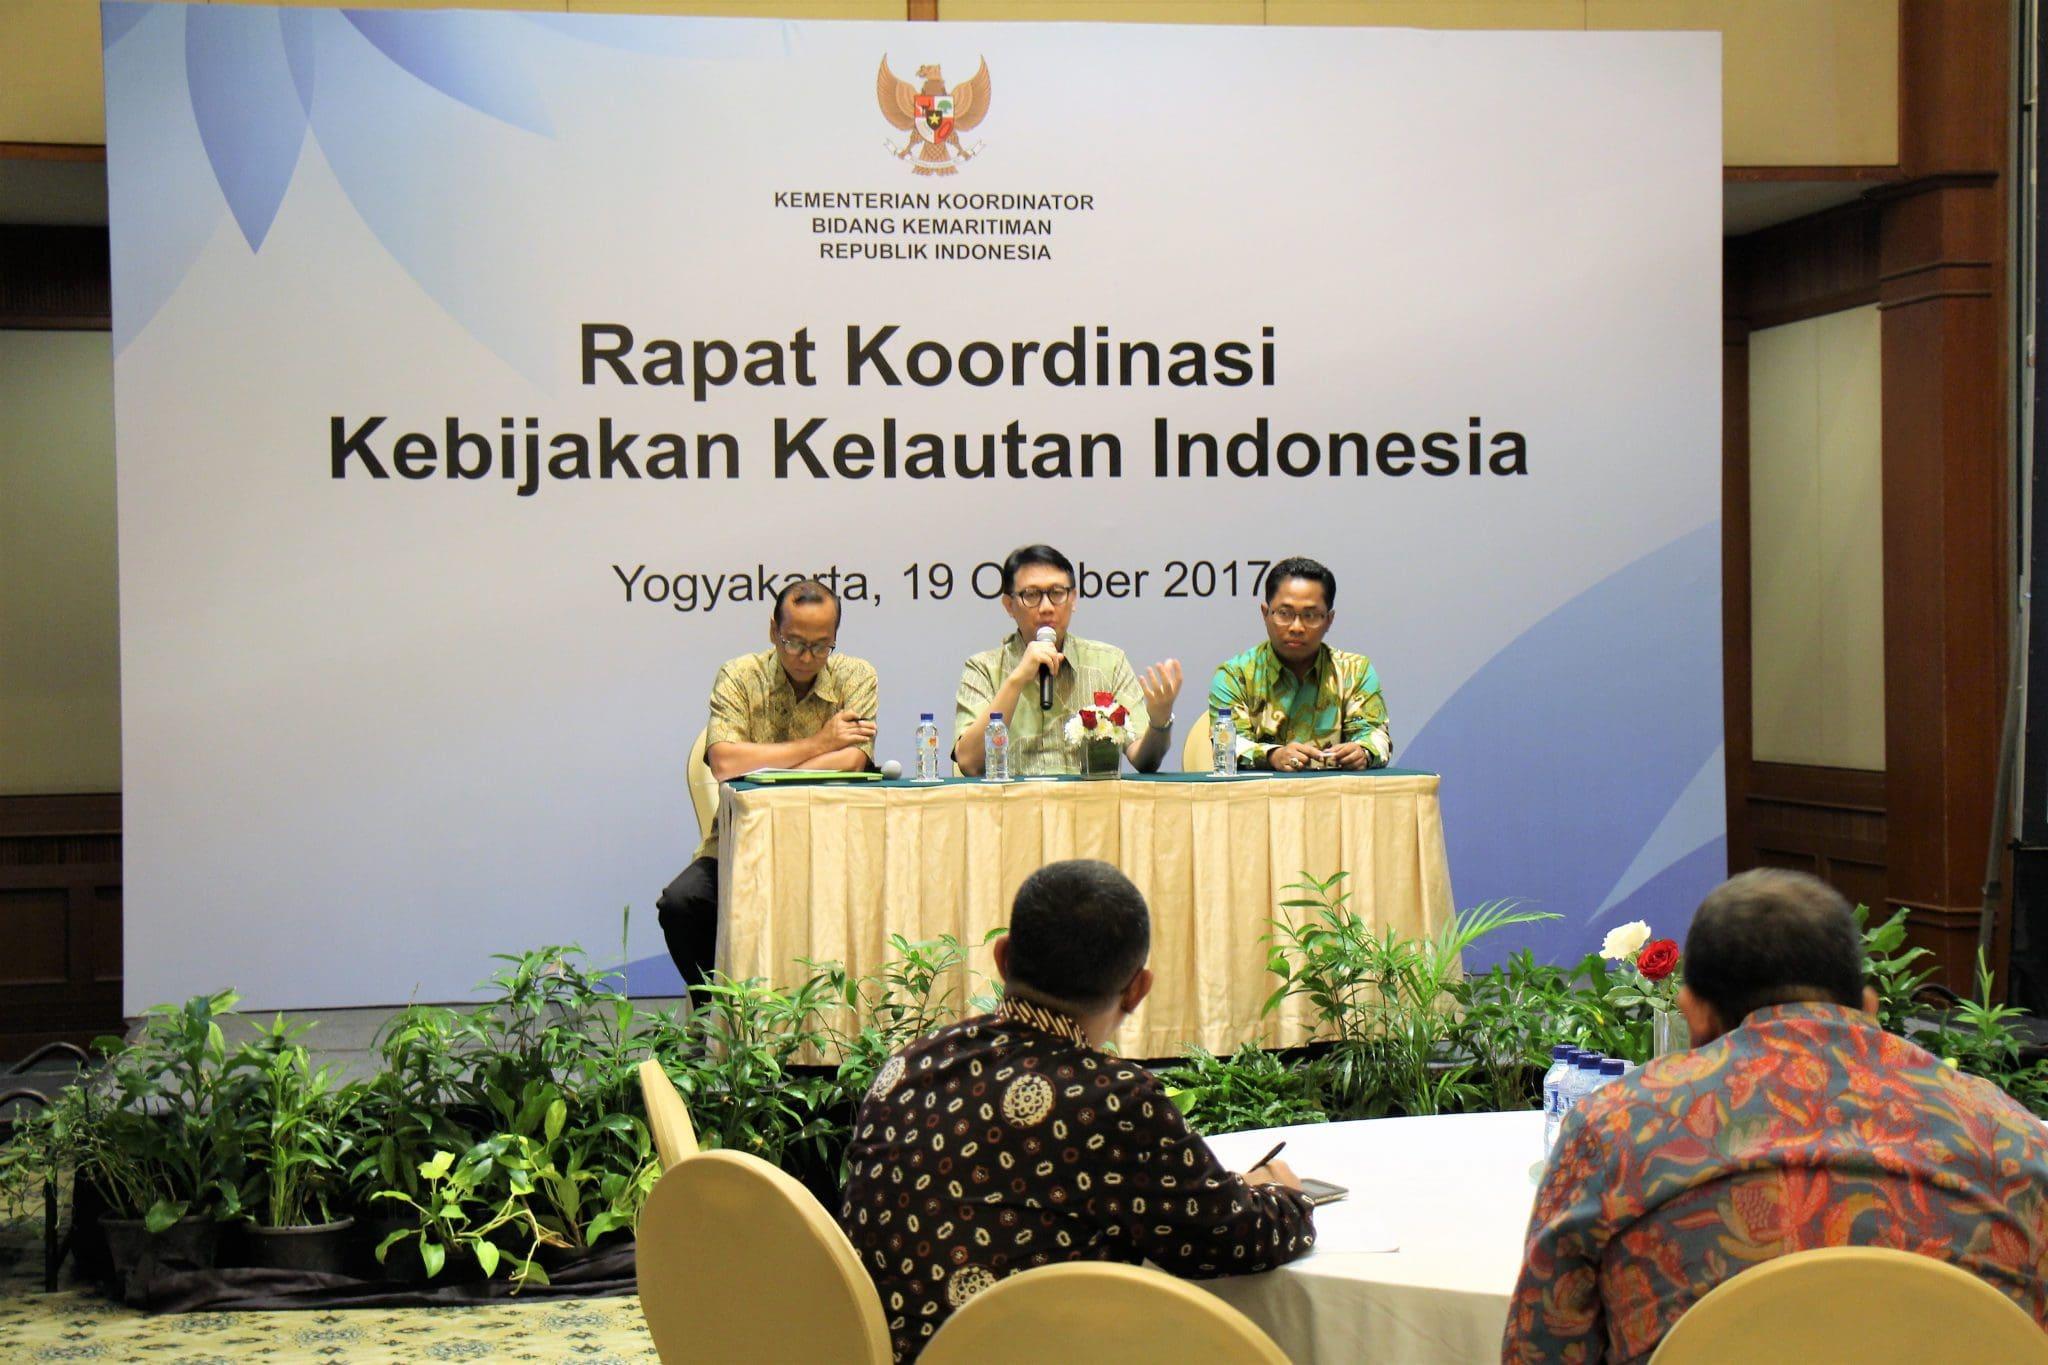 Deputi Havas Pimpin Rakor Penyusunan KKI di Yogyakarta